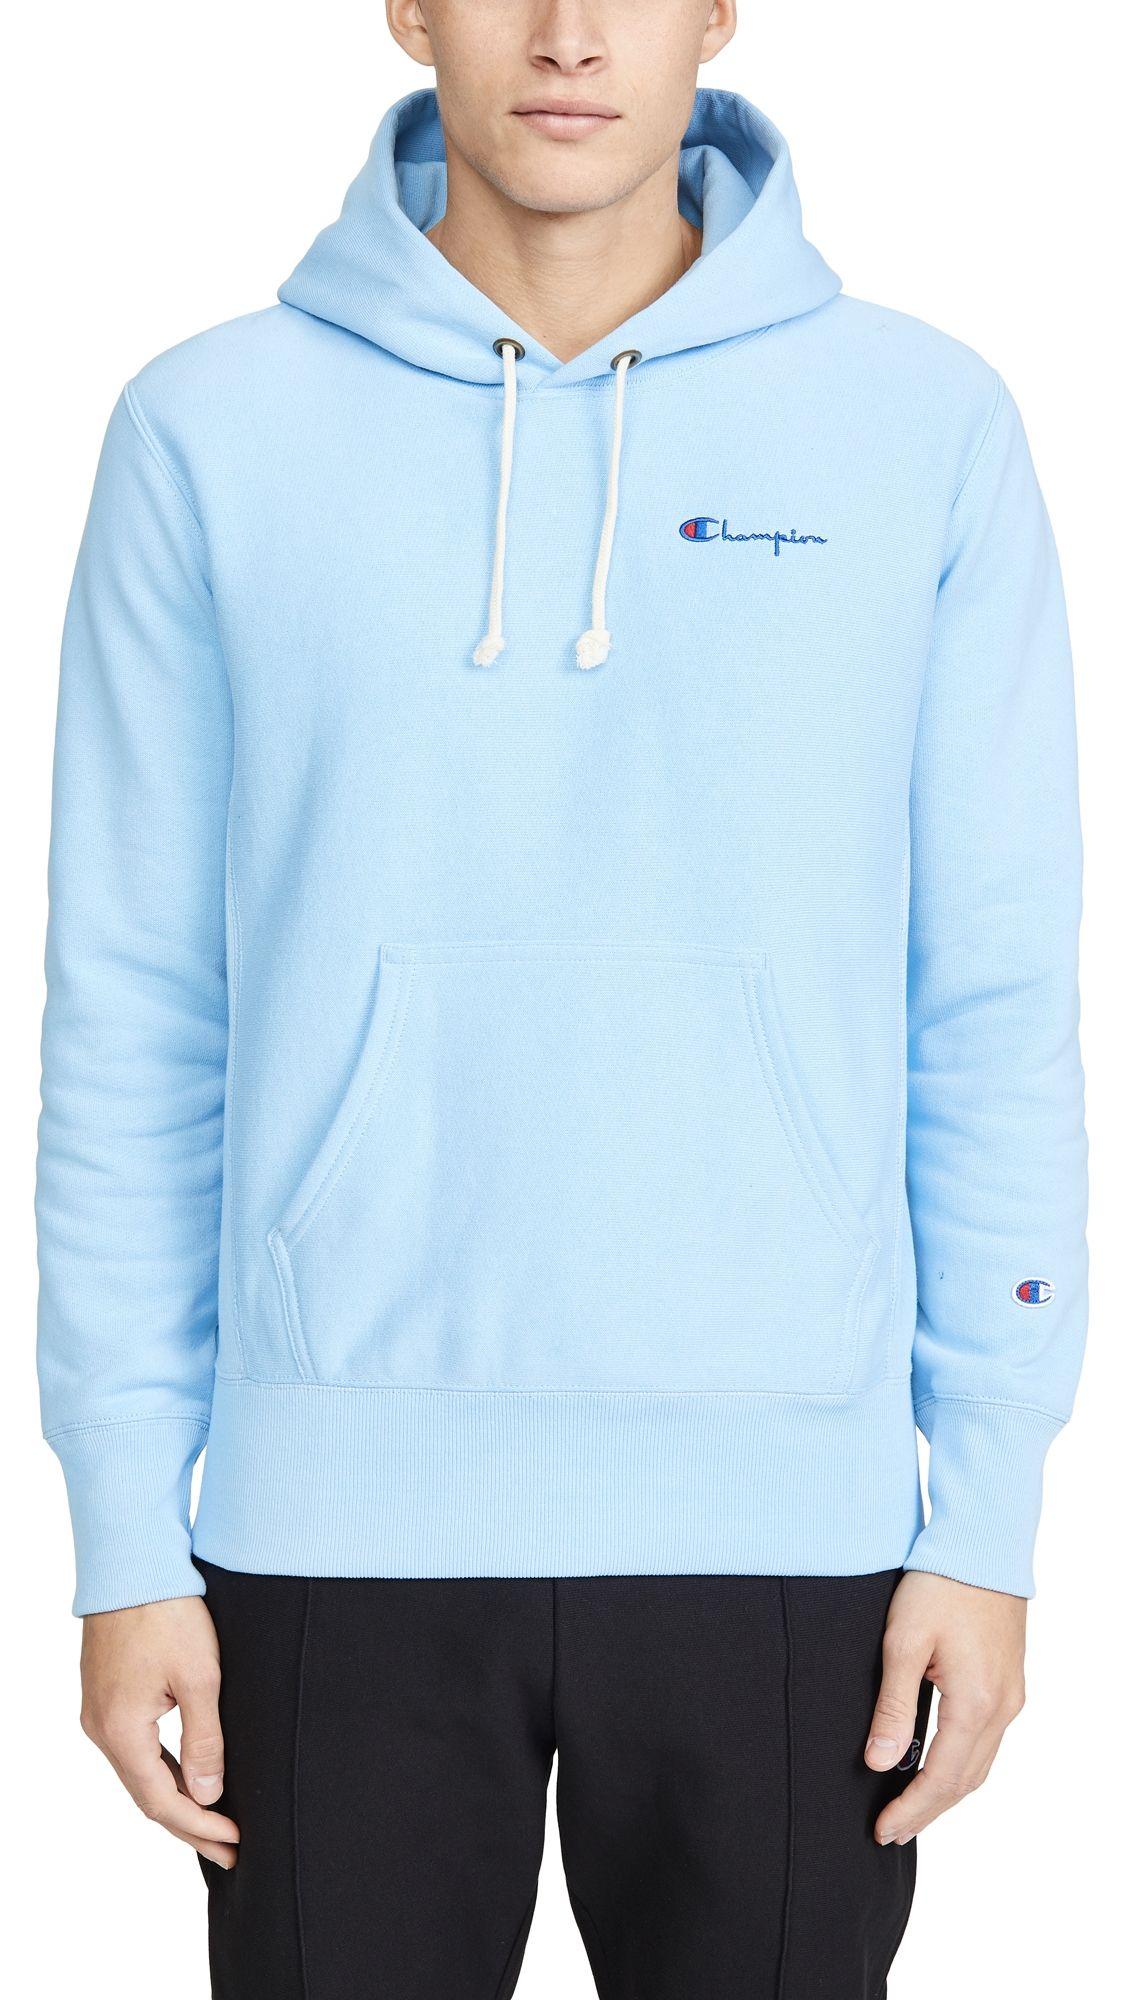 Champion Small Script Logo Hooded Sweatshirt Champion Cloth Hooded Sweatshirts Sweatshirts Sweatshirt Fabric [ 2000 x 1128 Pixel ]